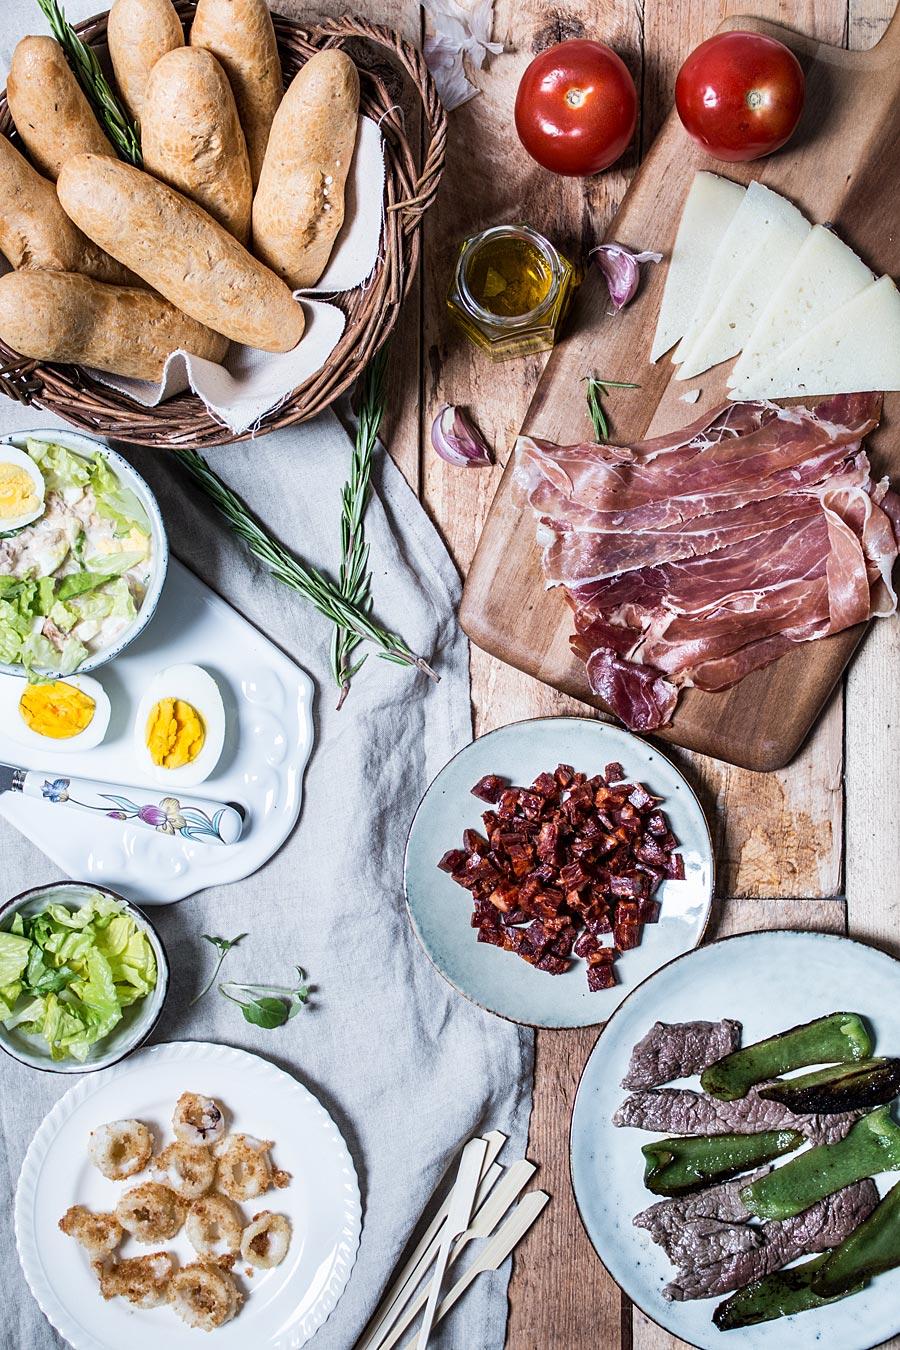 Spanish tapas sandwiches (Paleo | Gluten free) | Lau Sunday cooks